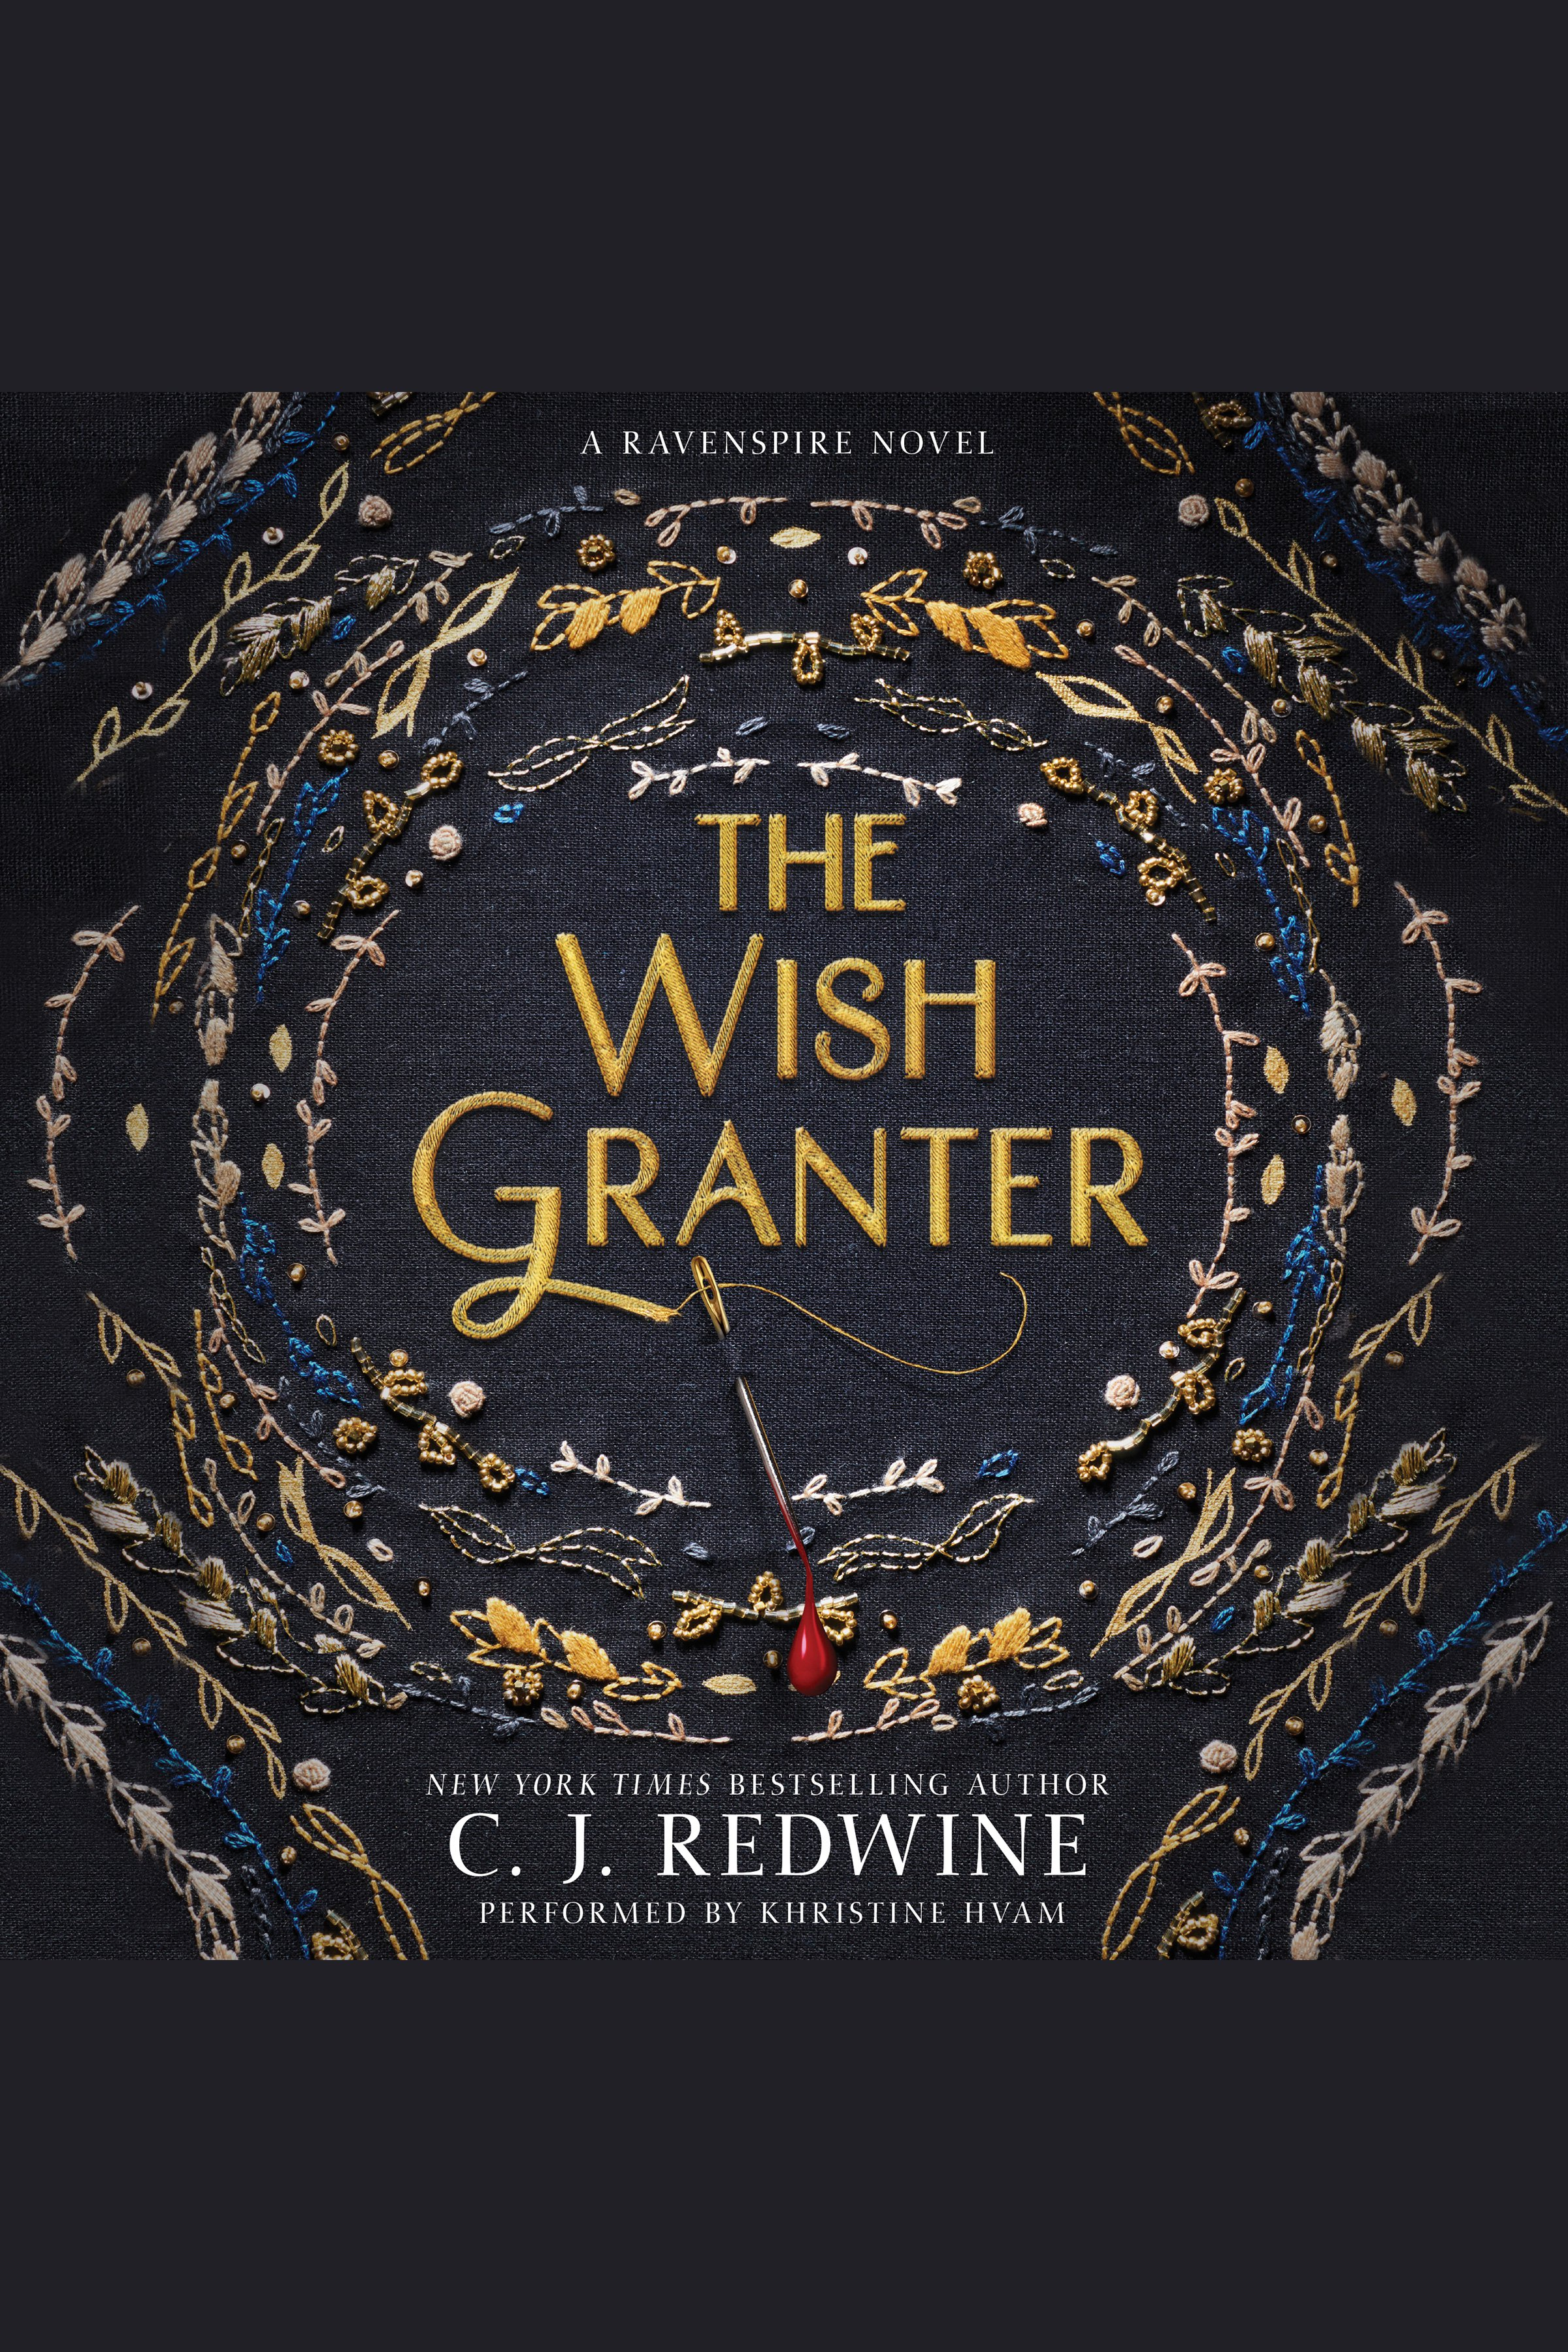 The Wish Granter cover image